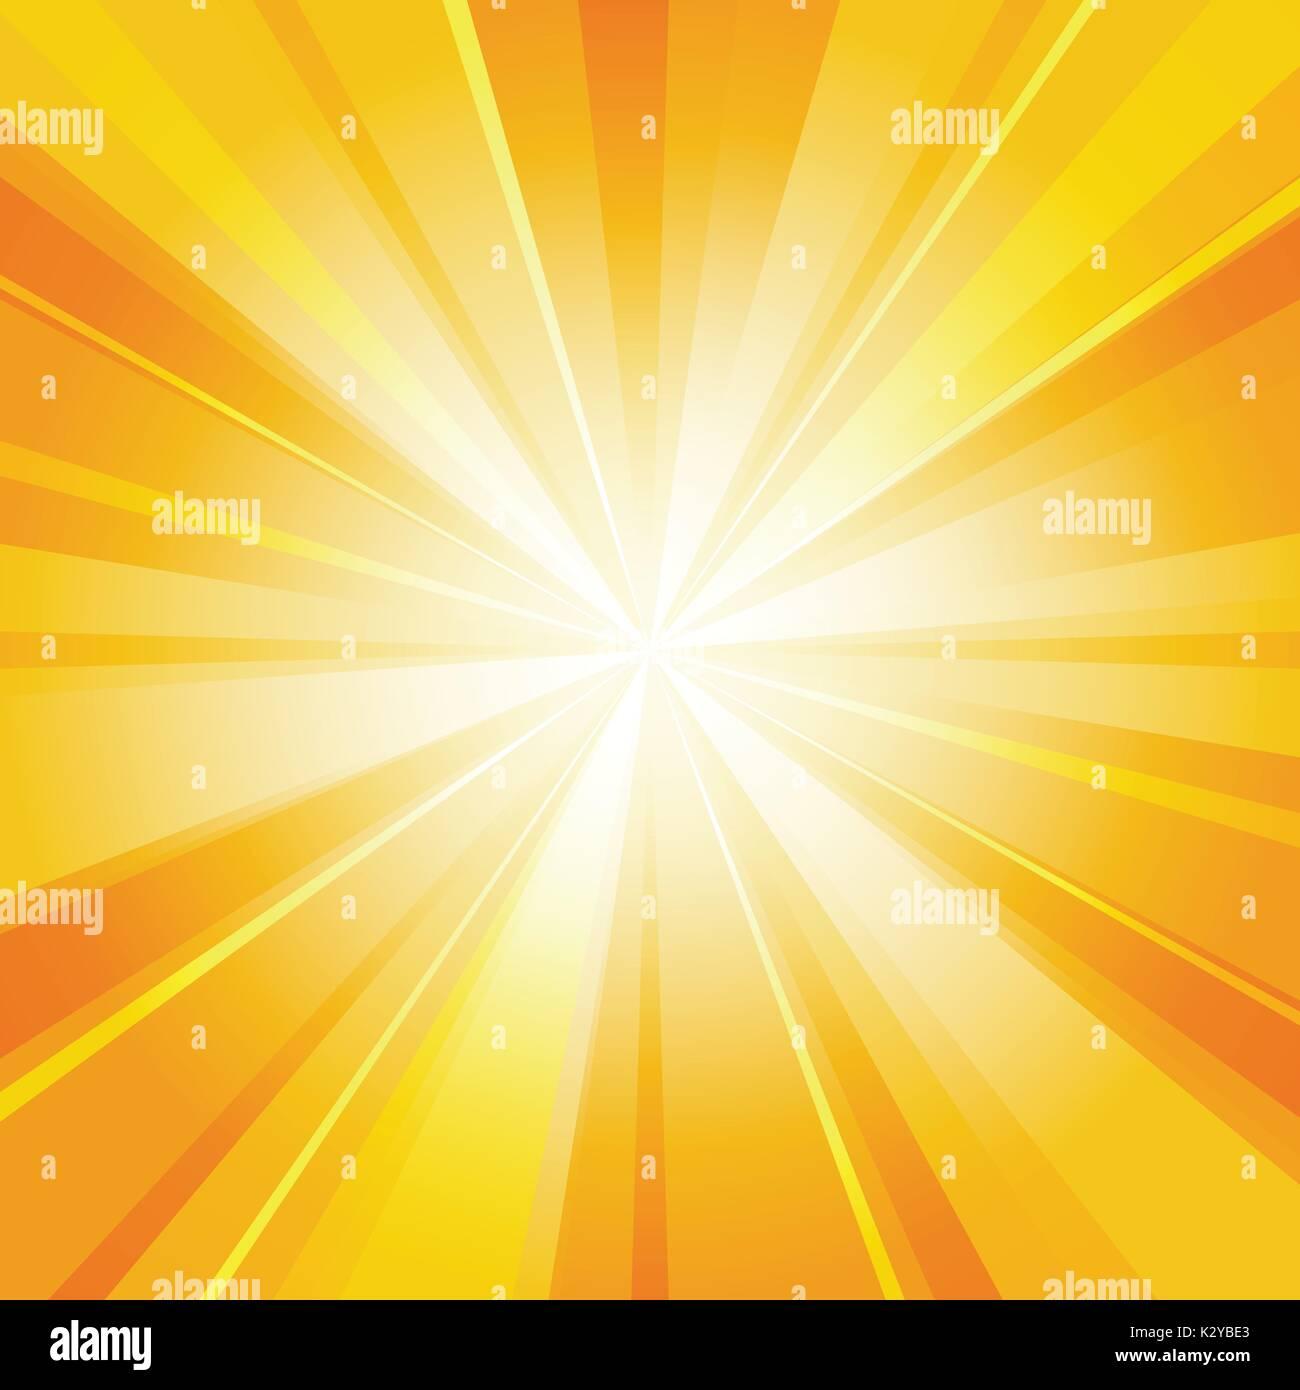 Shiny sun radiator vector background. Sunny rays radiating light yellow pattern - Stock Image